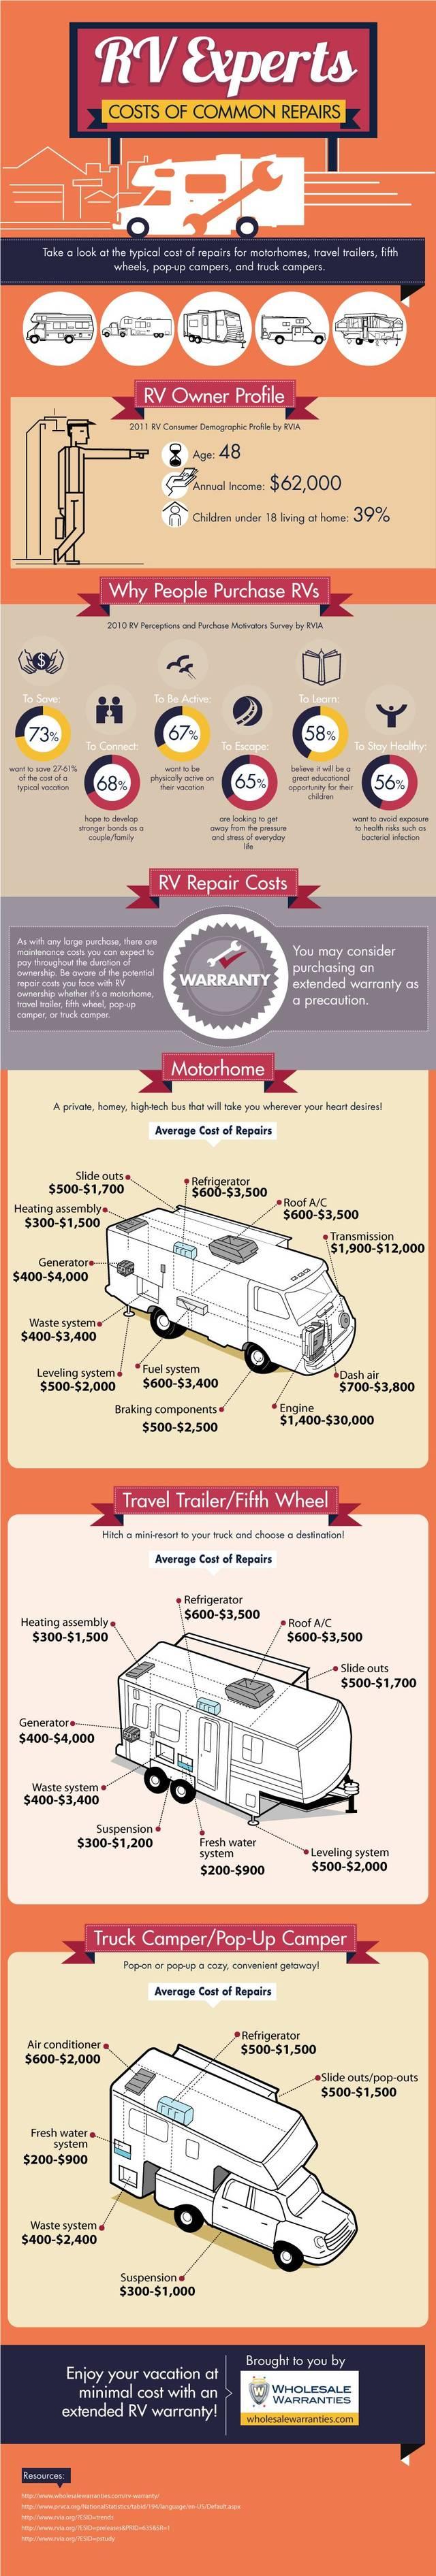 Rv repairs cost infographic